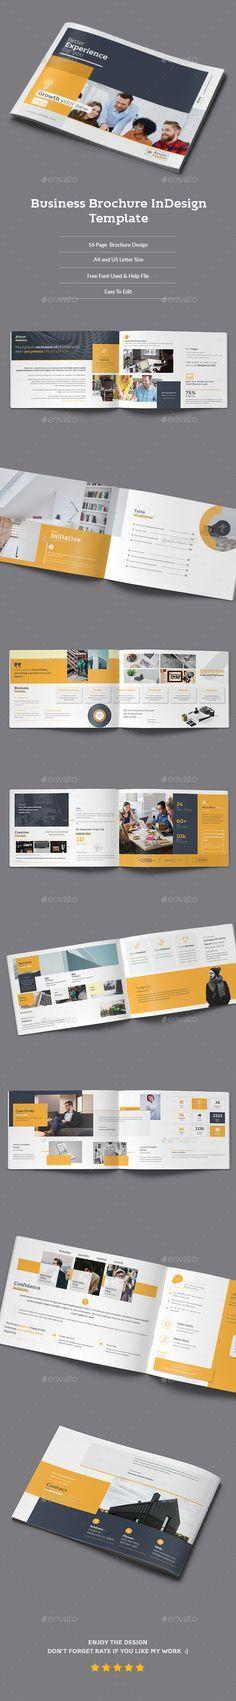 pin by fdesign nerd on hotel travel brochure brochure template